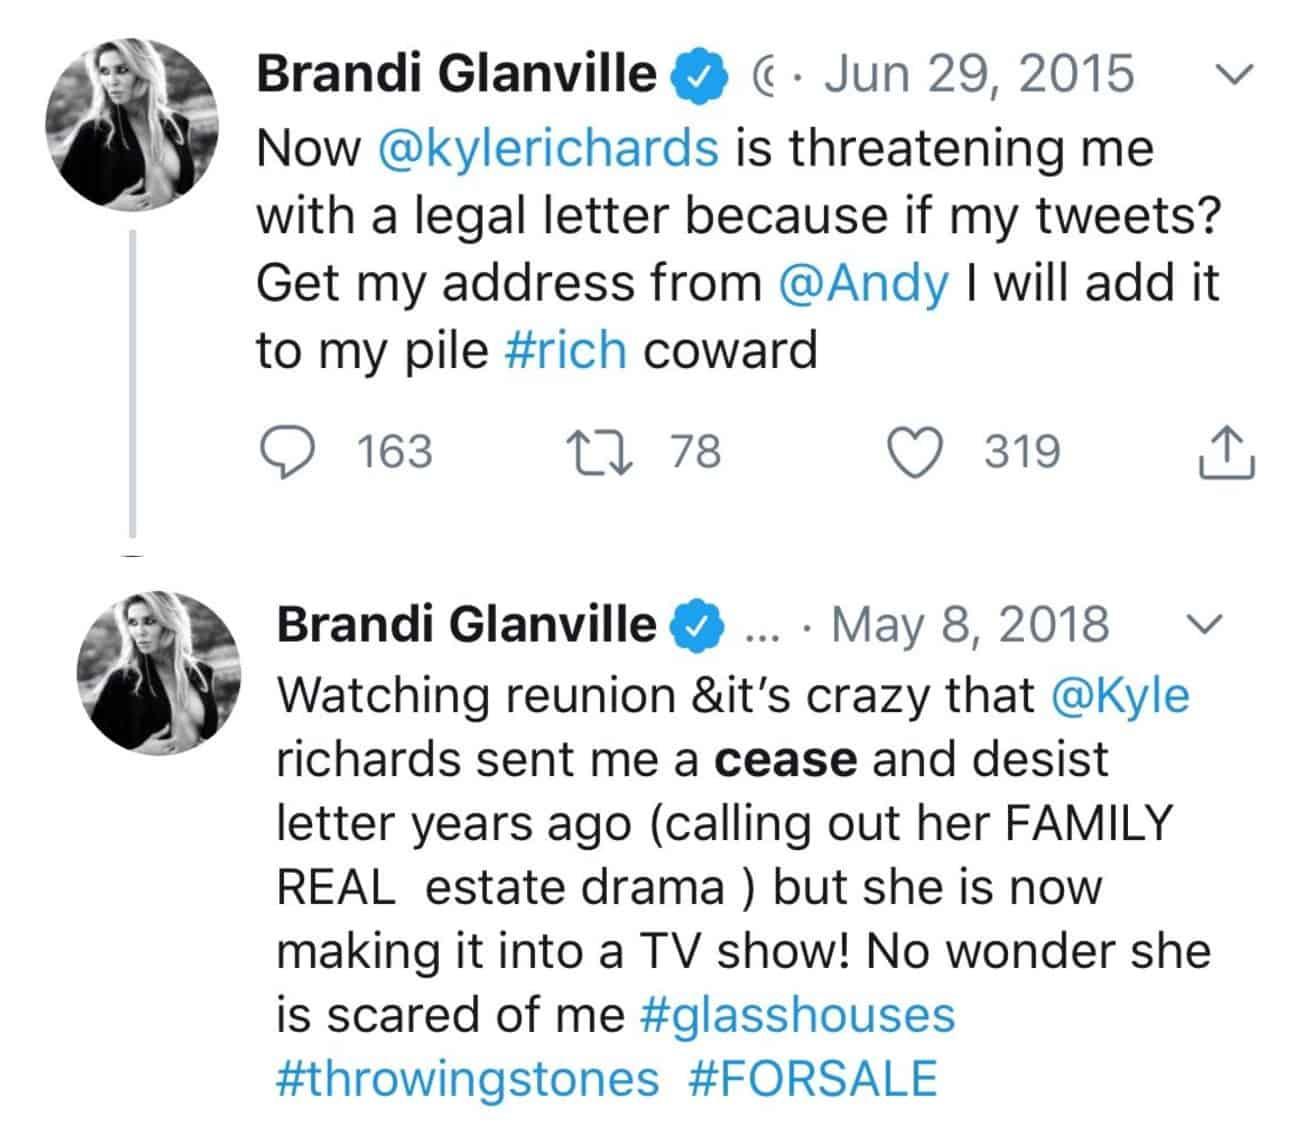 BRandi Glanville Accuses Kyle Richards of Sending Her Cease and Desist